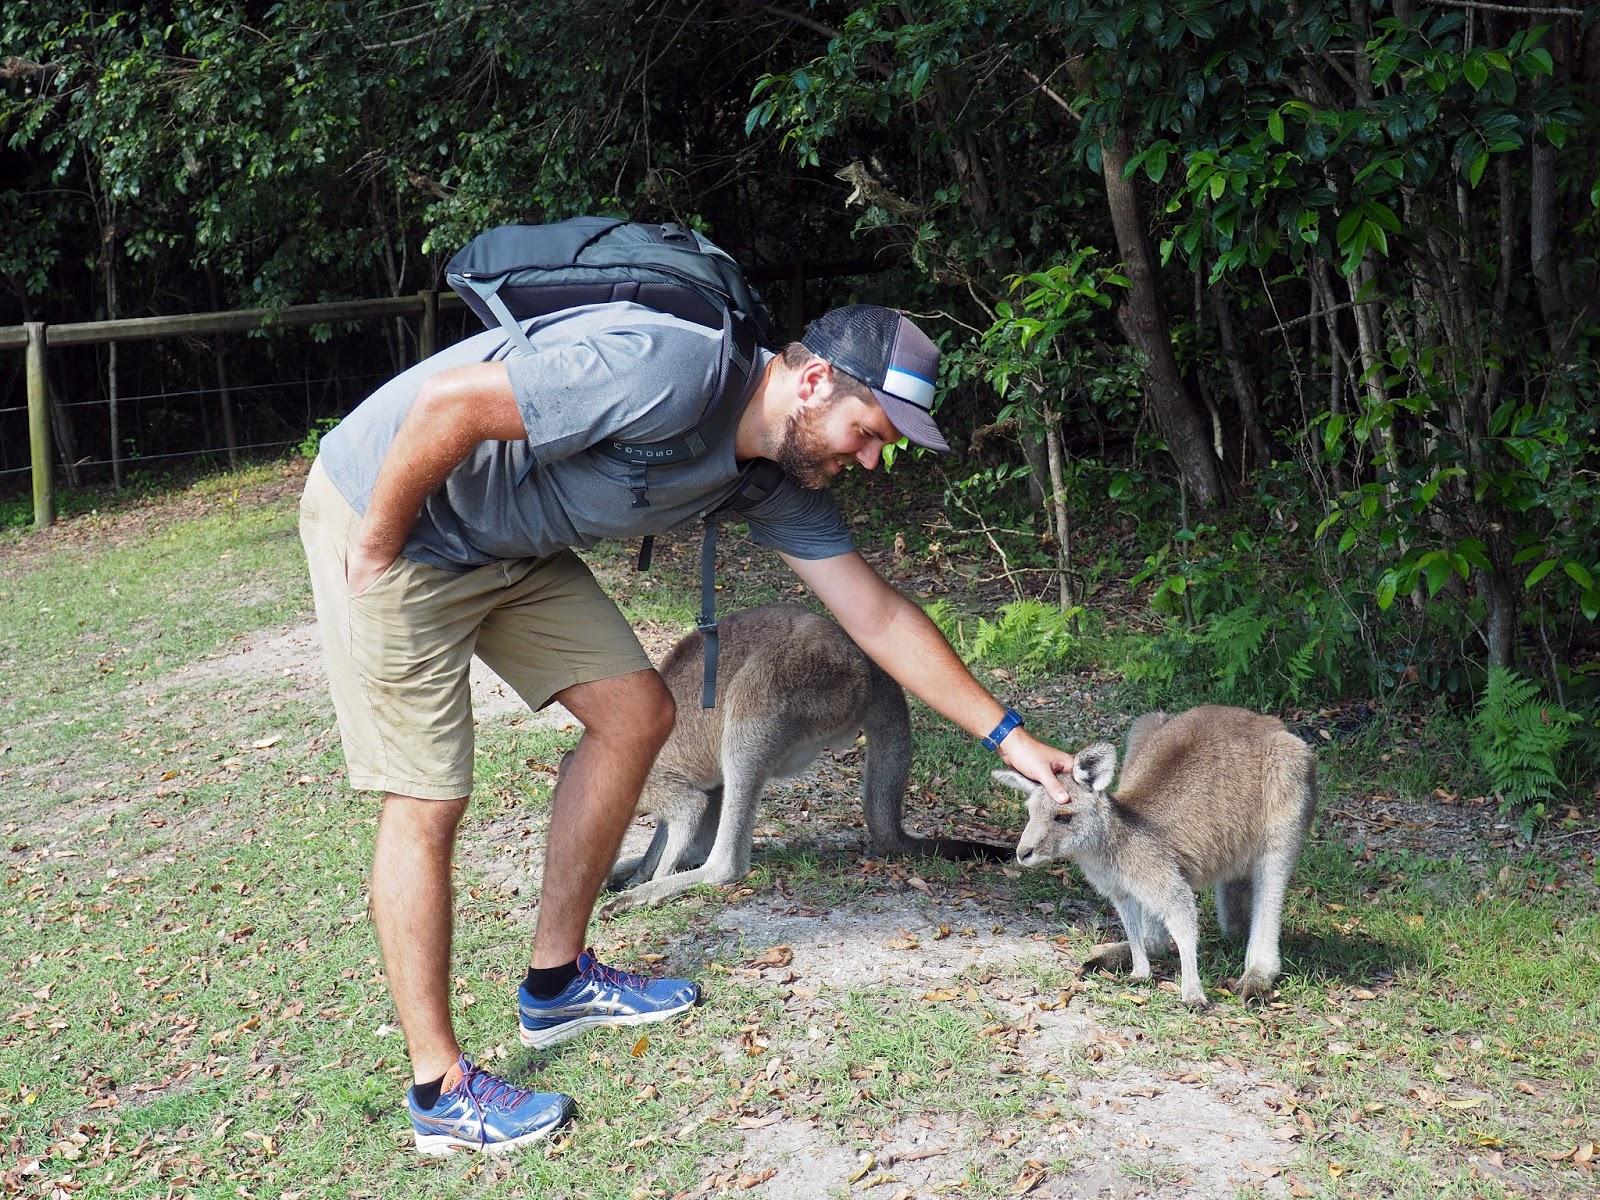 Male with Kangaroos at Diamond Head Campground